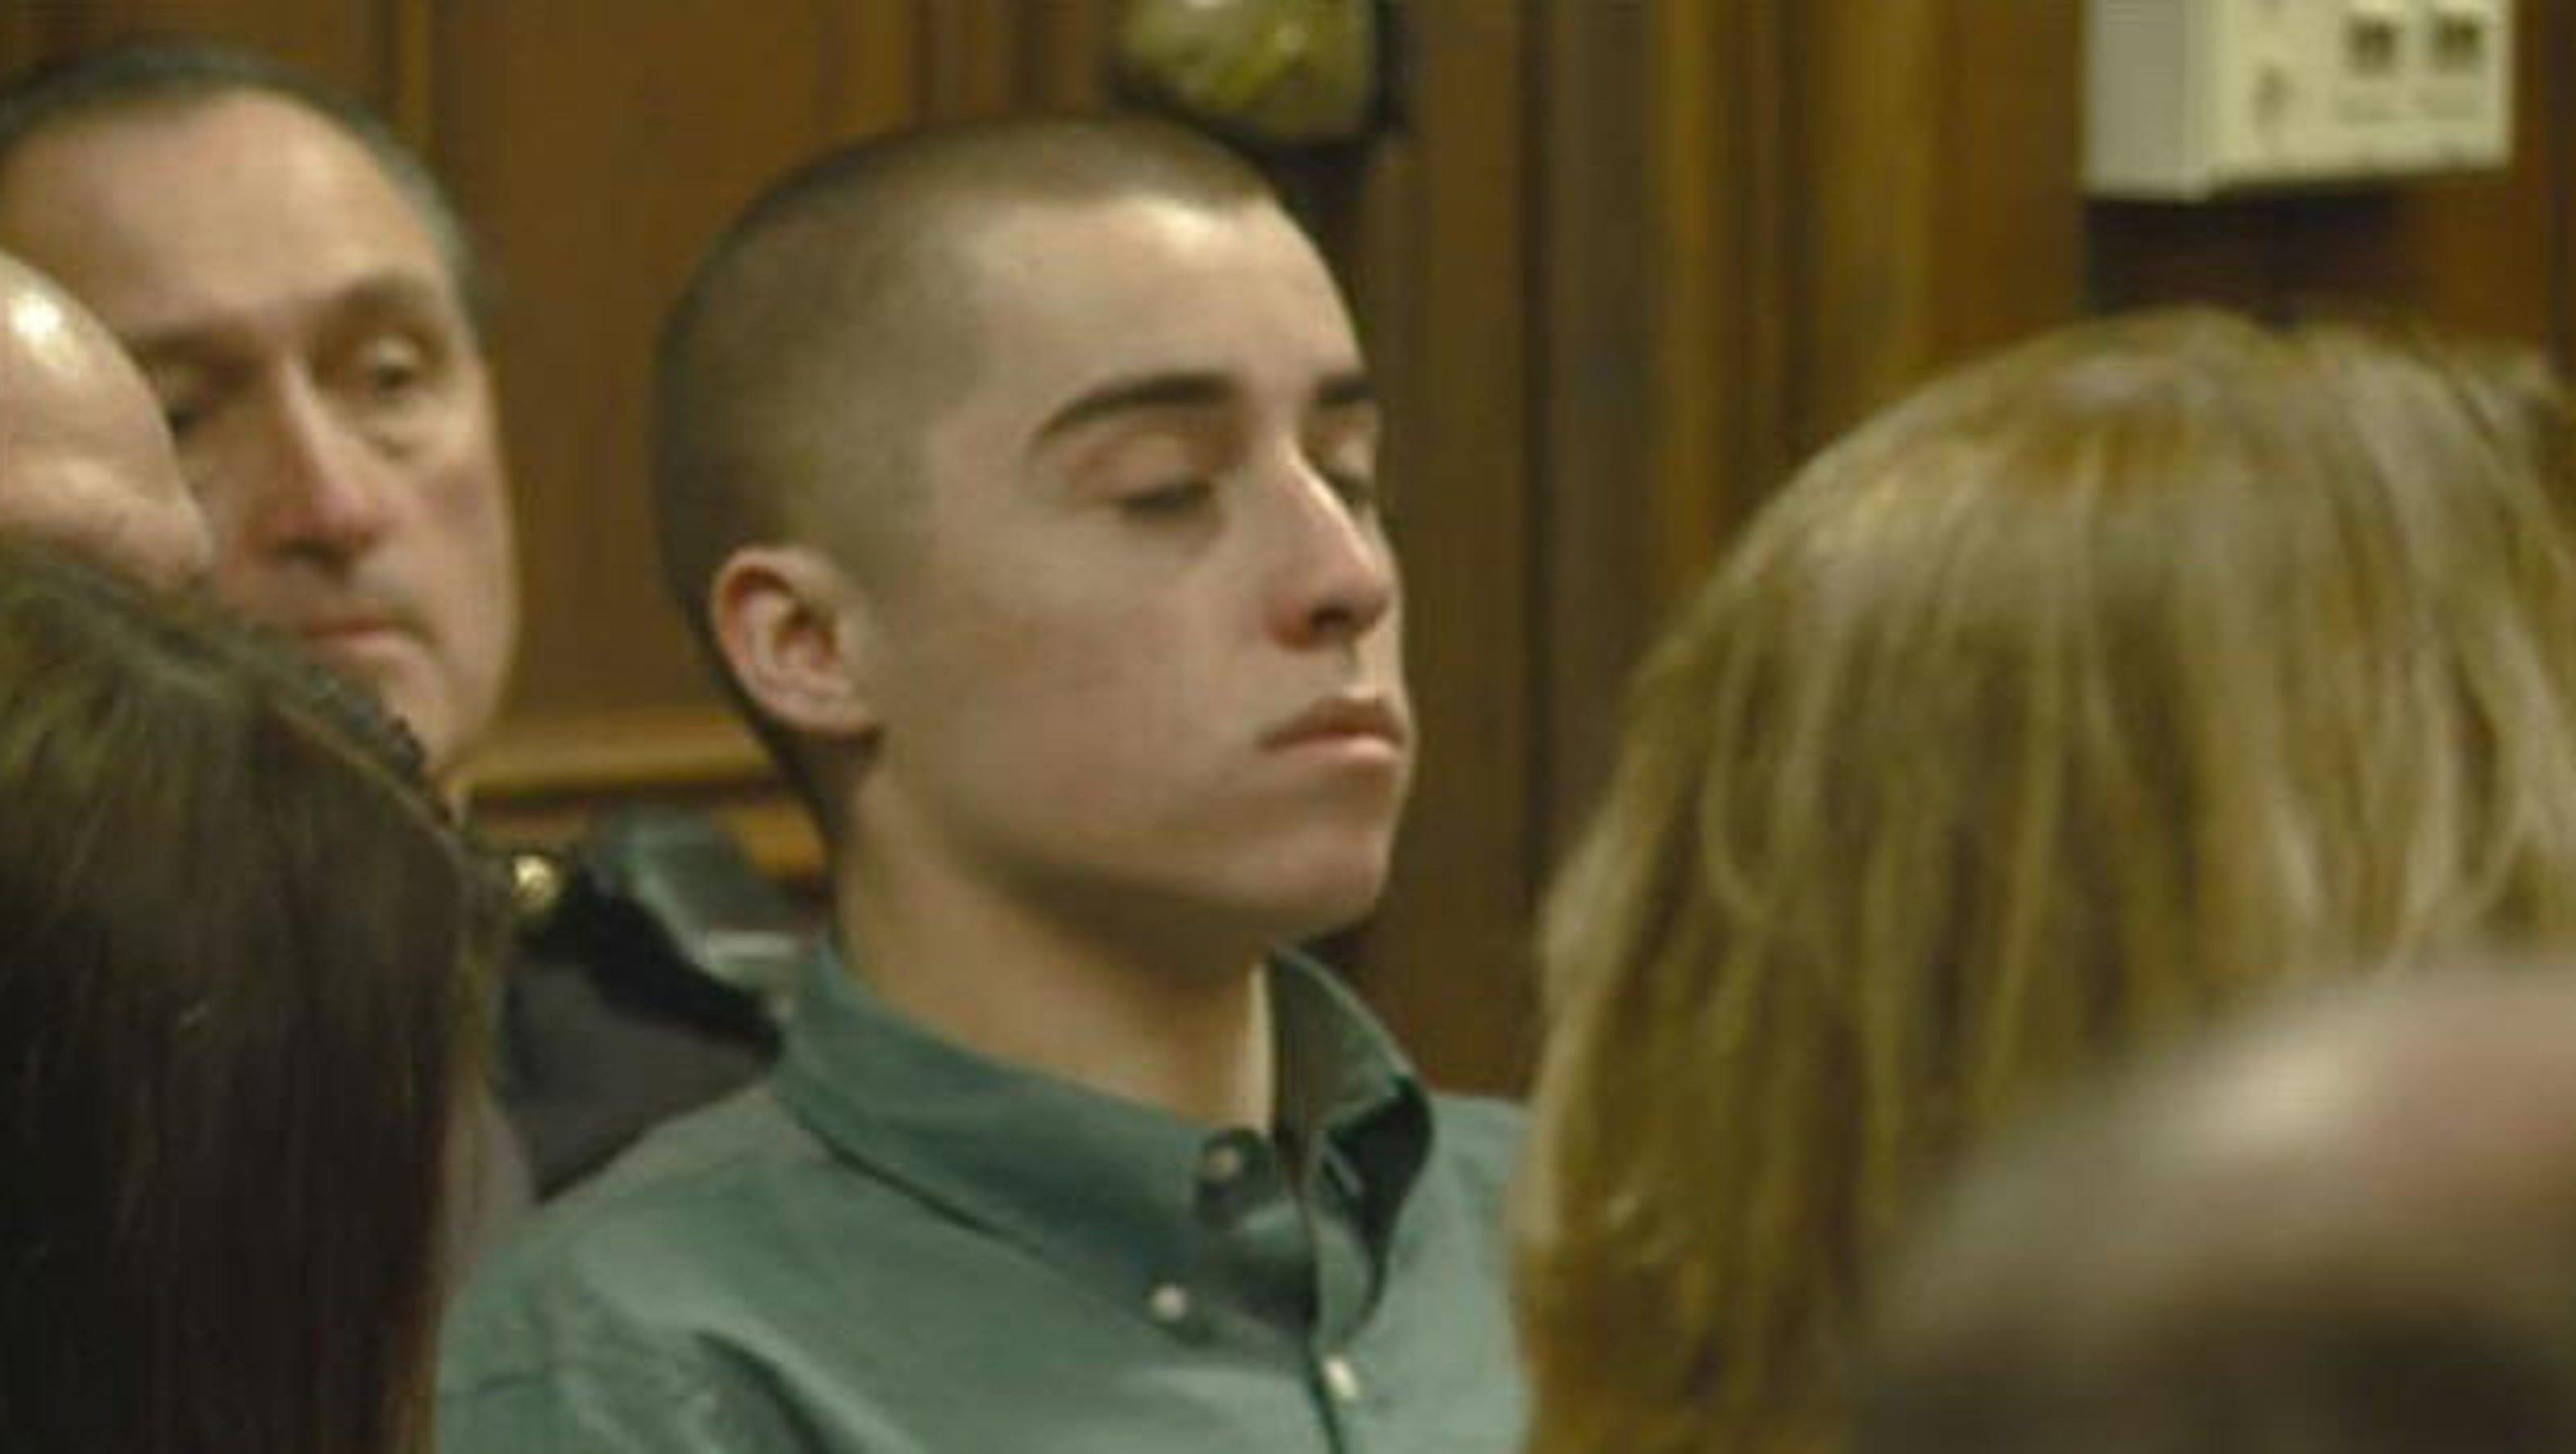 4 disciplined after Chardon shooter TJ Lane's escape